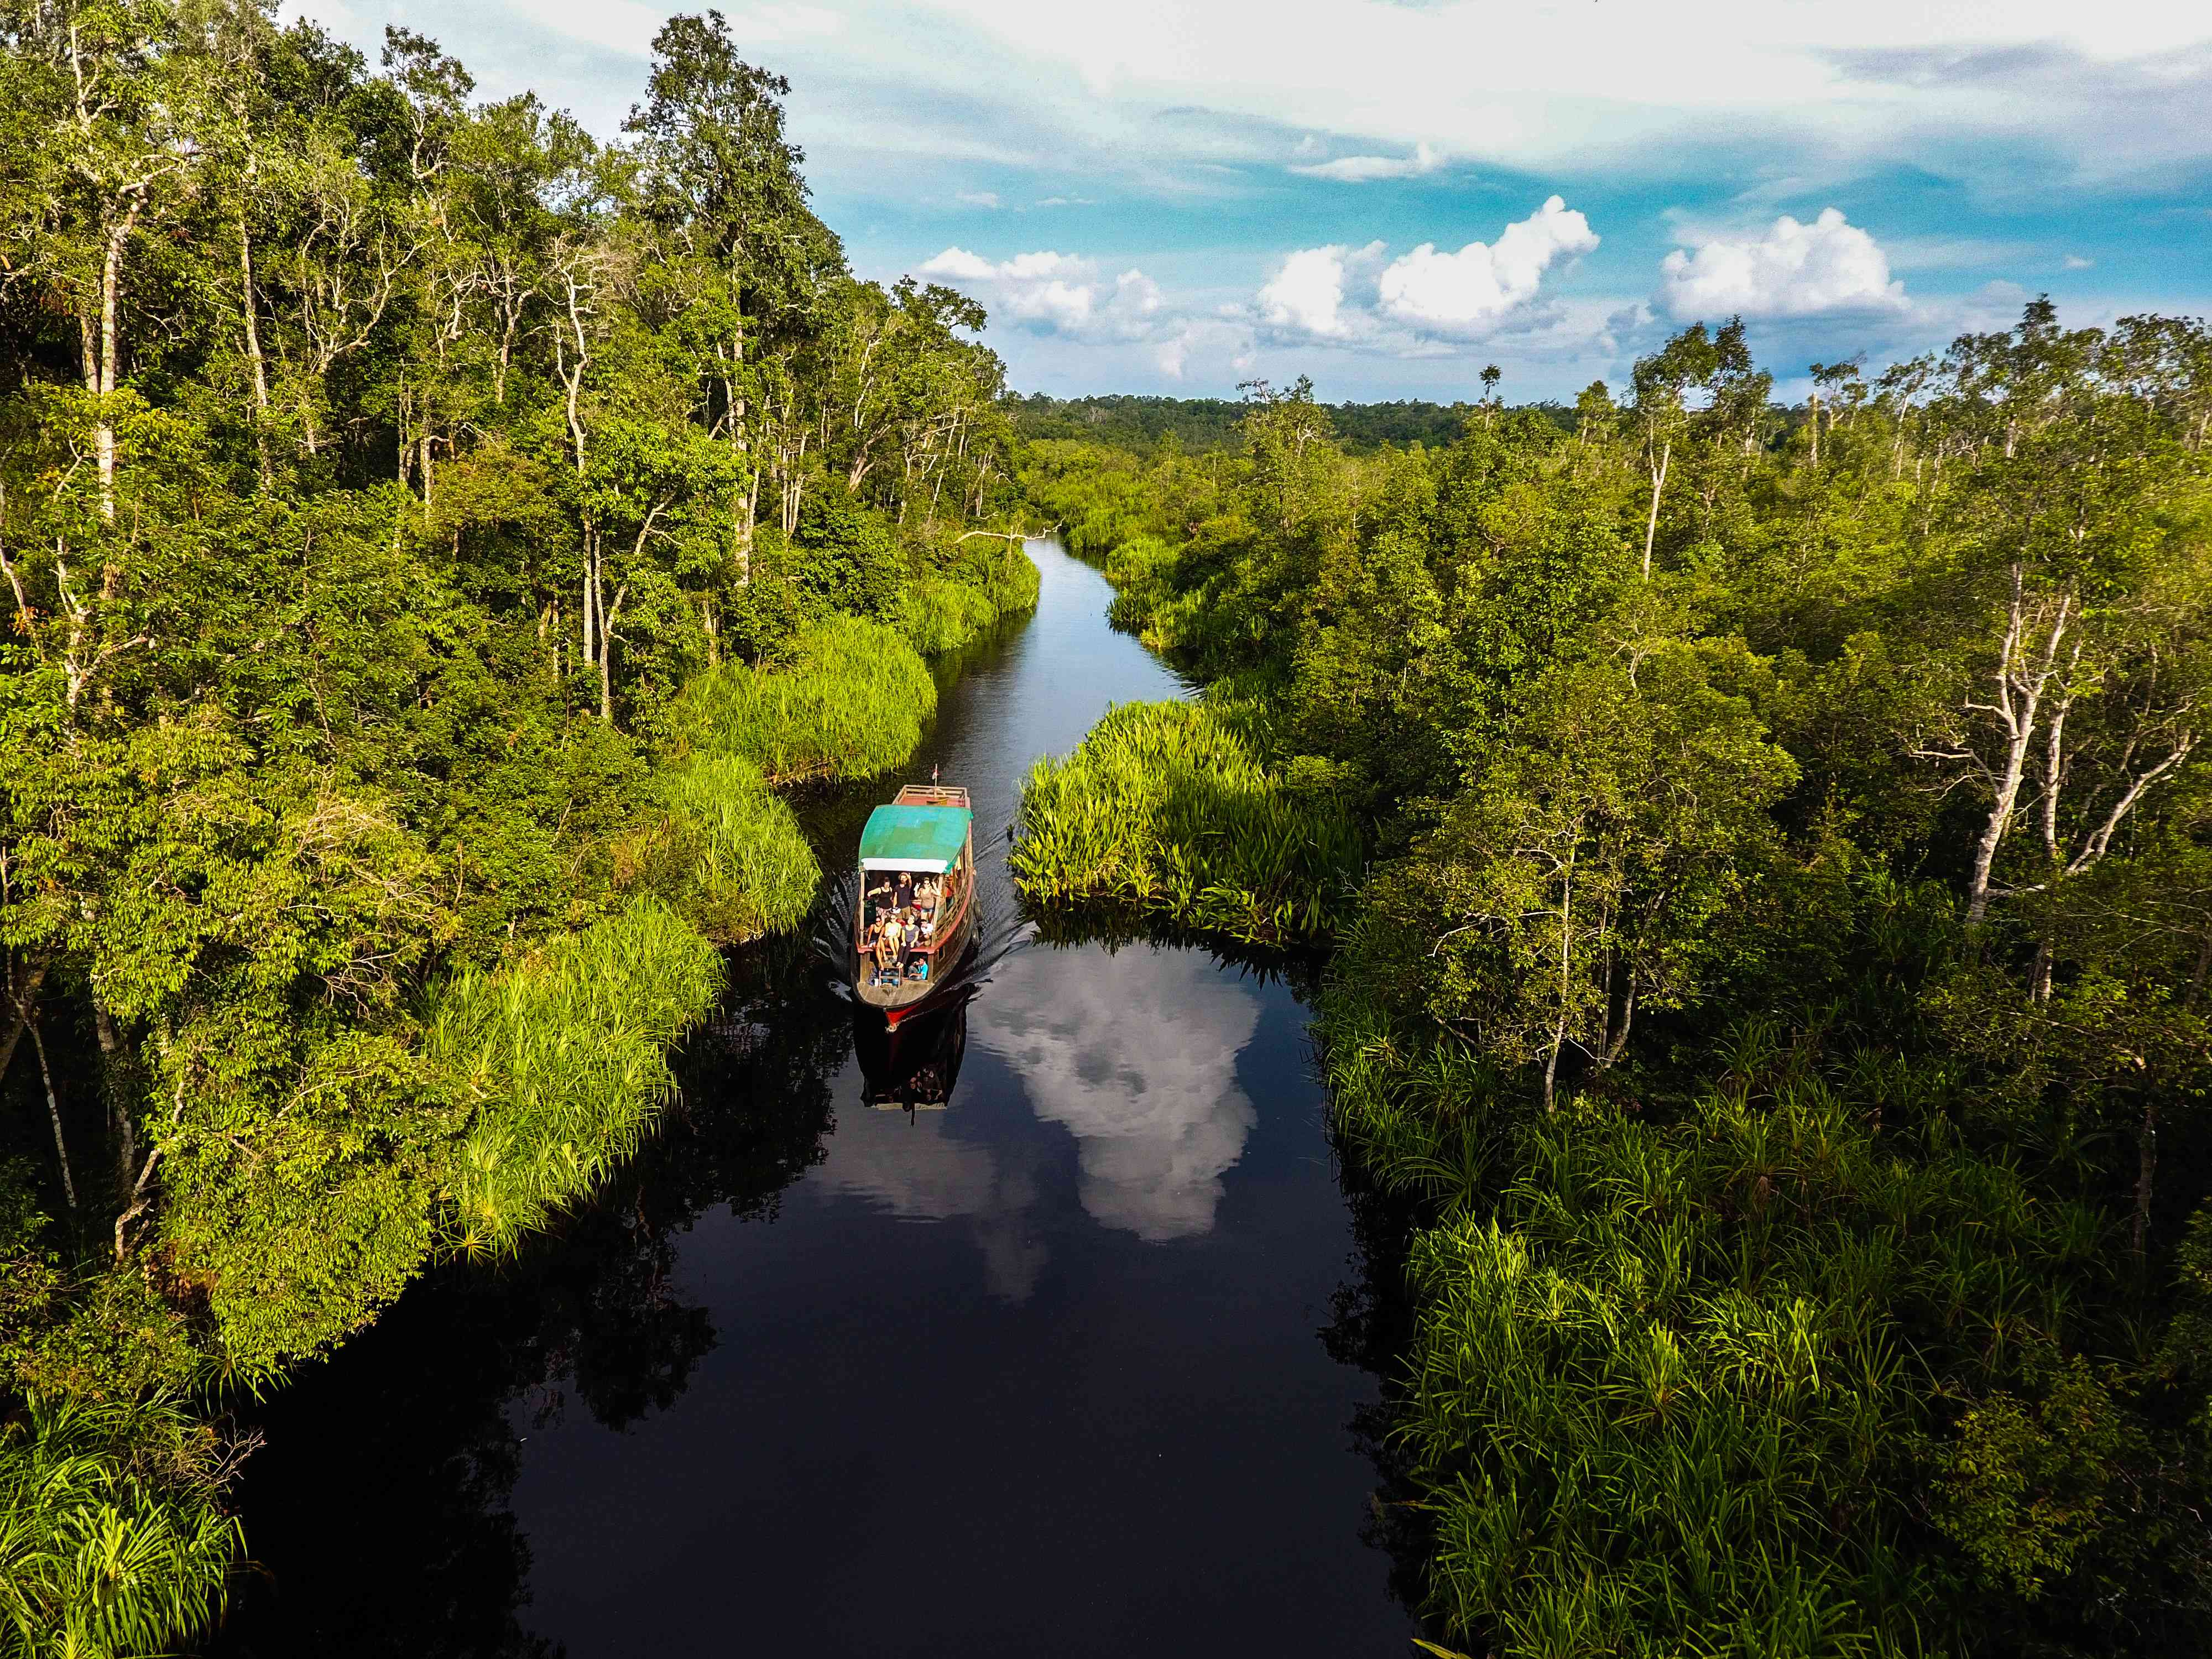 A boat on a river in Borneo